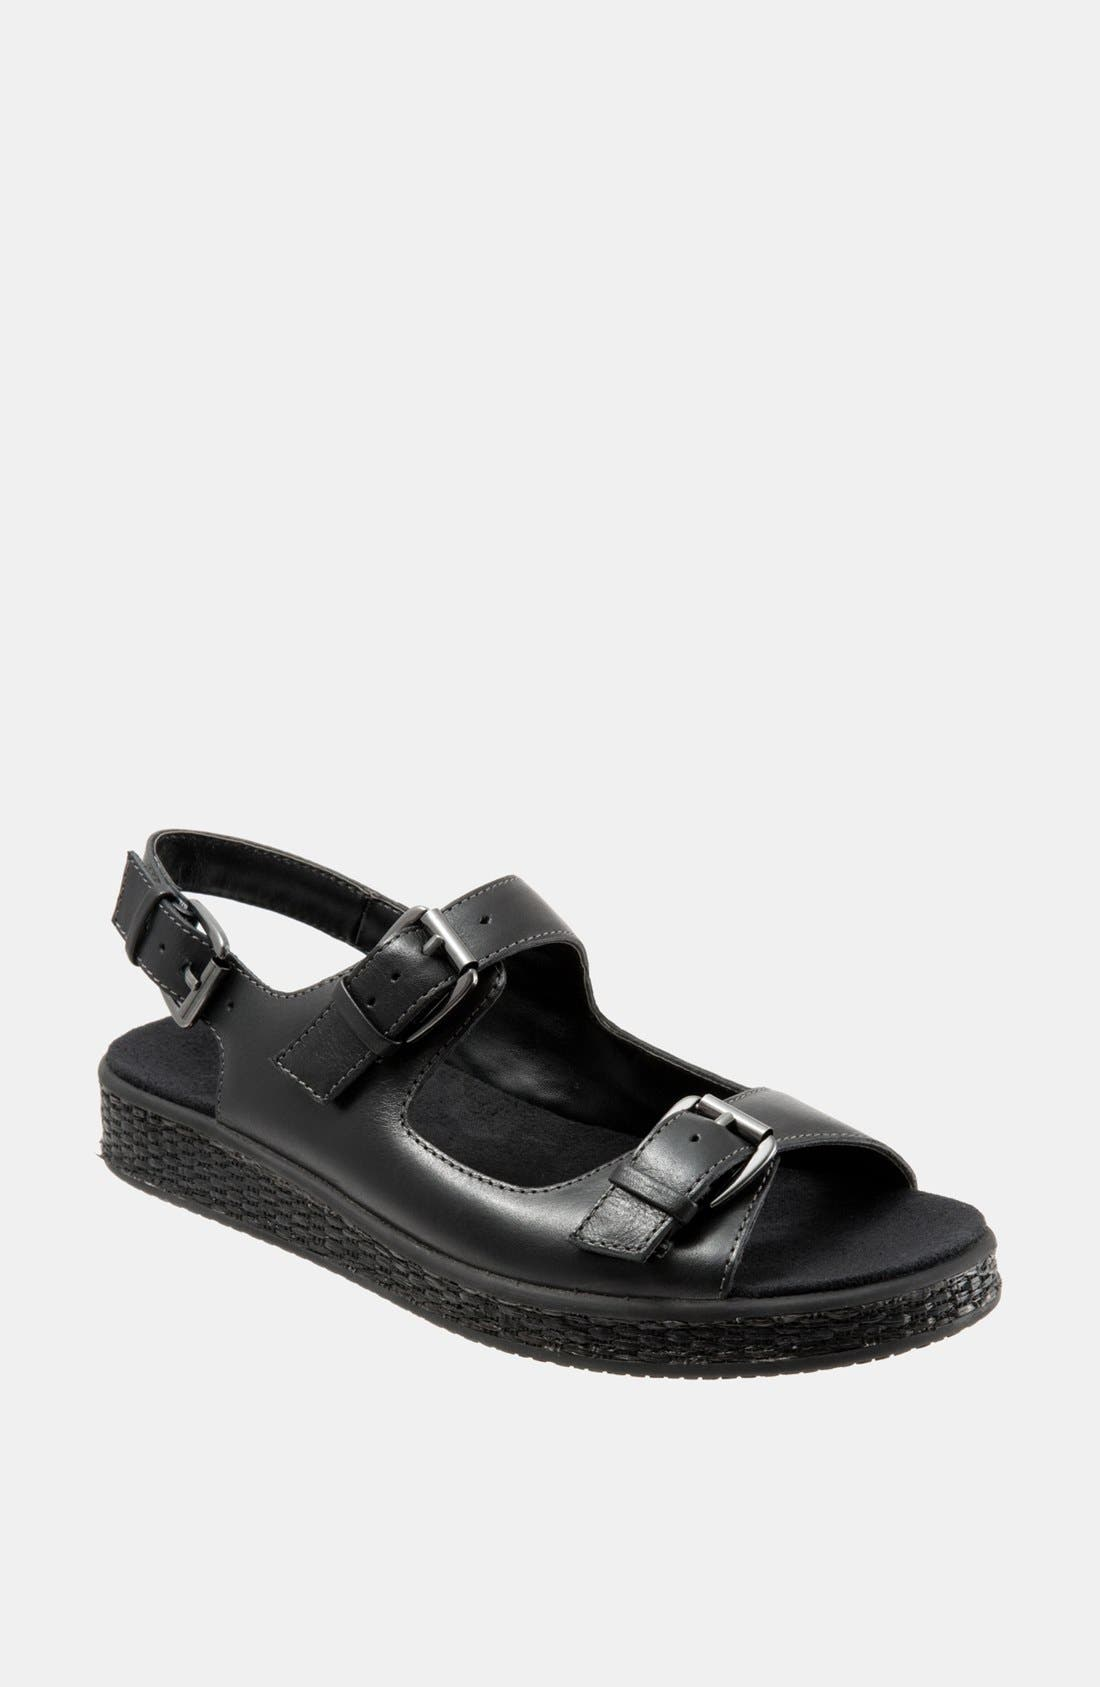 Alternate Image 1 Selected - Trotters 'Bibi' Sandal